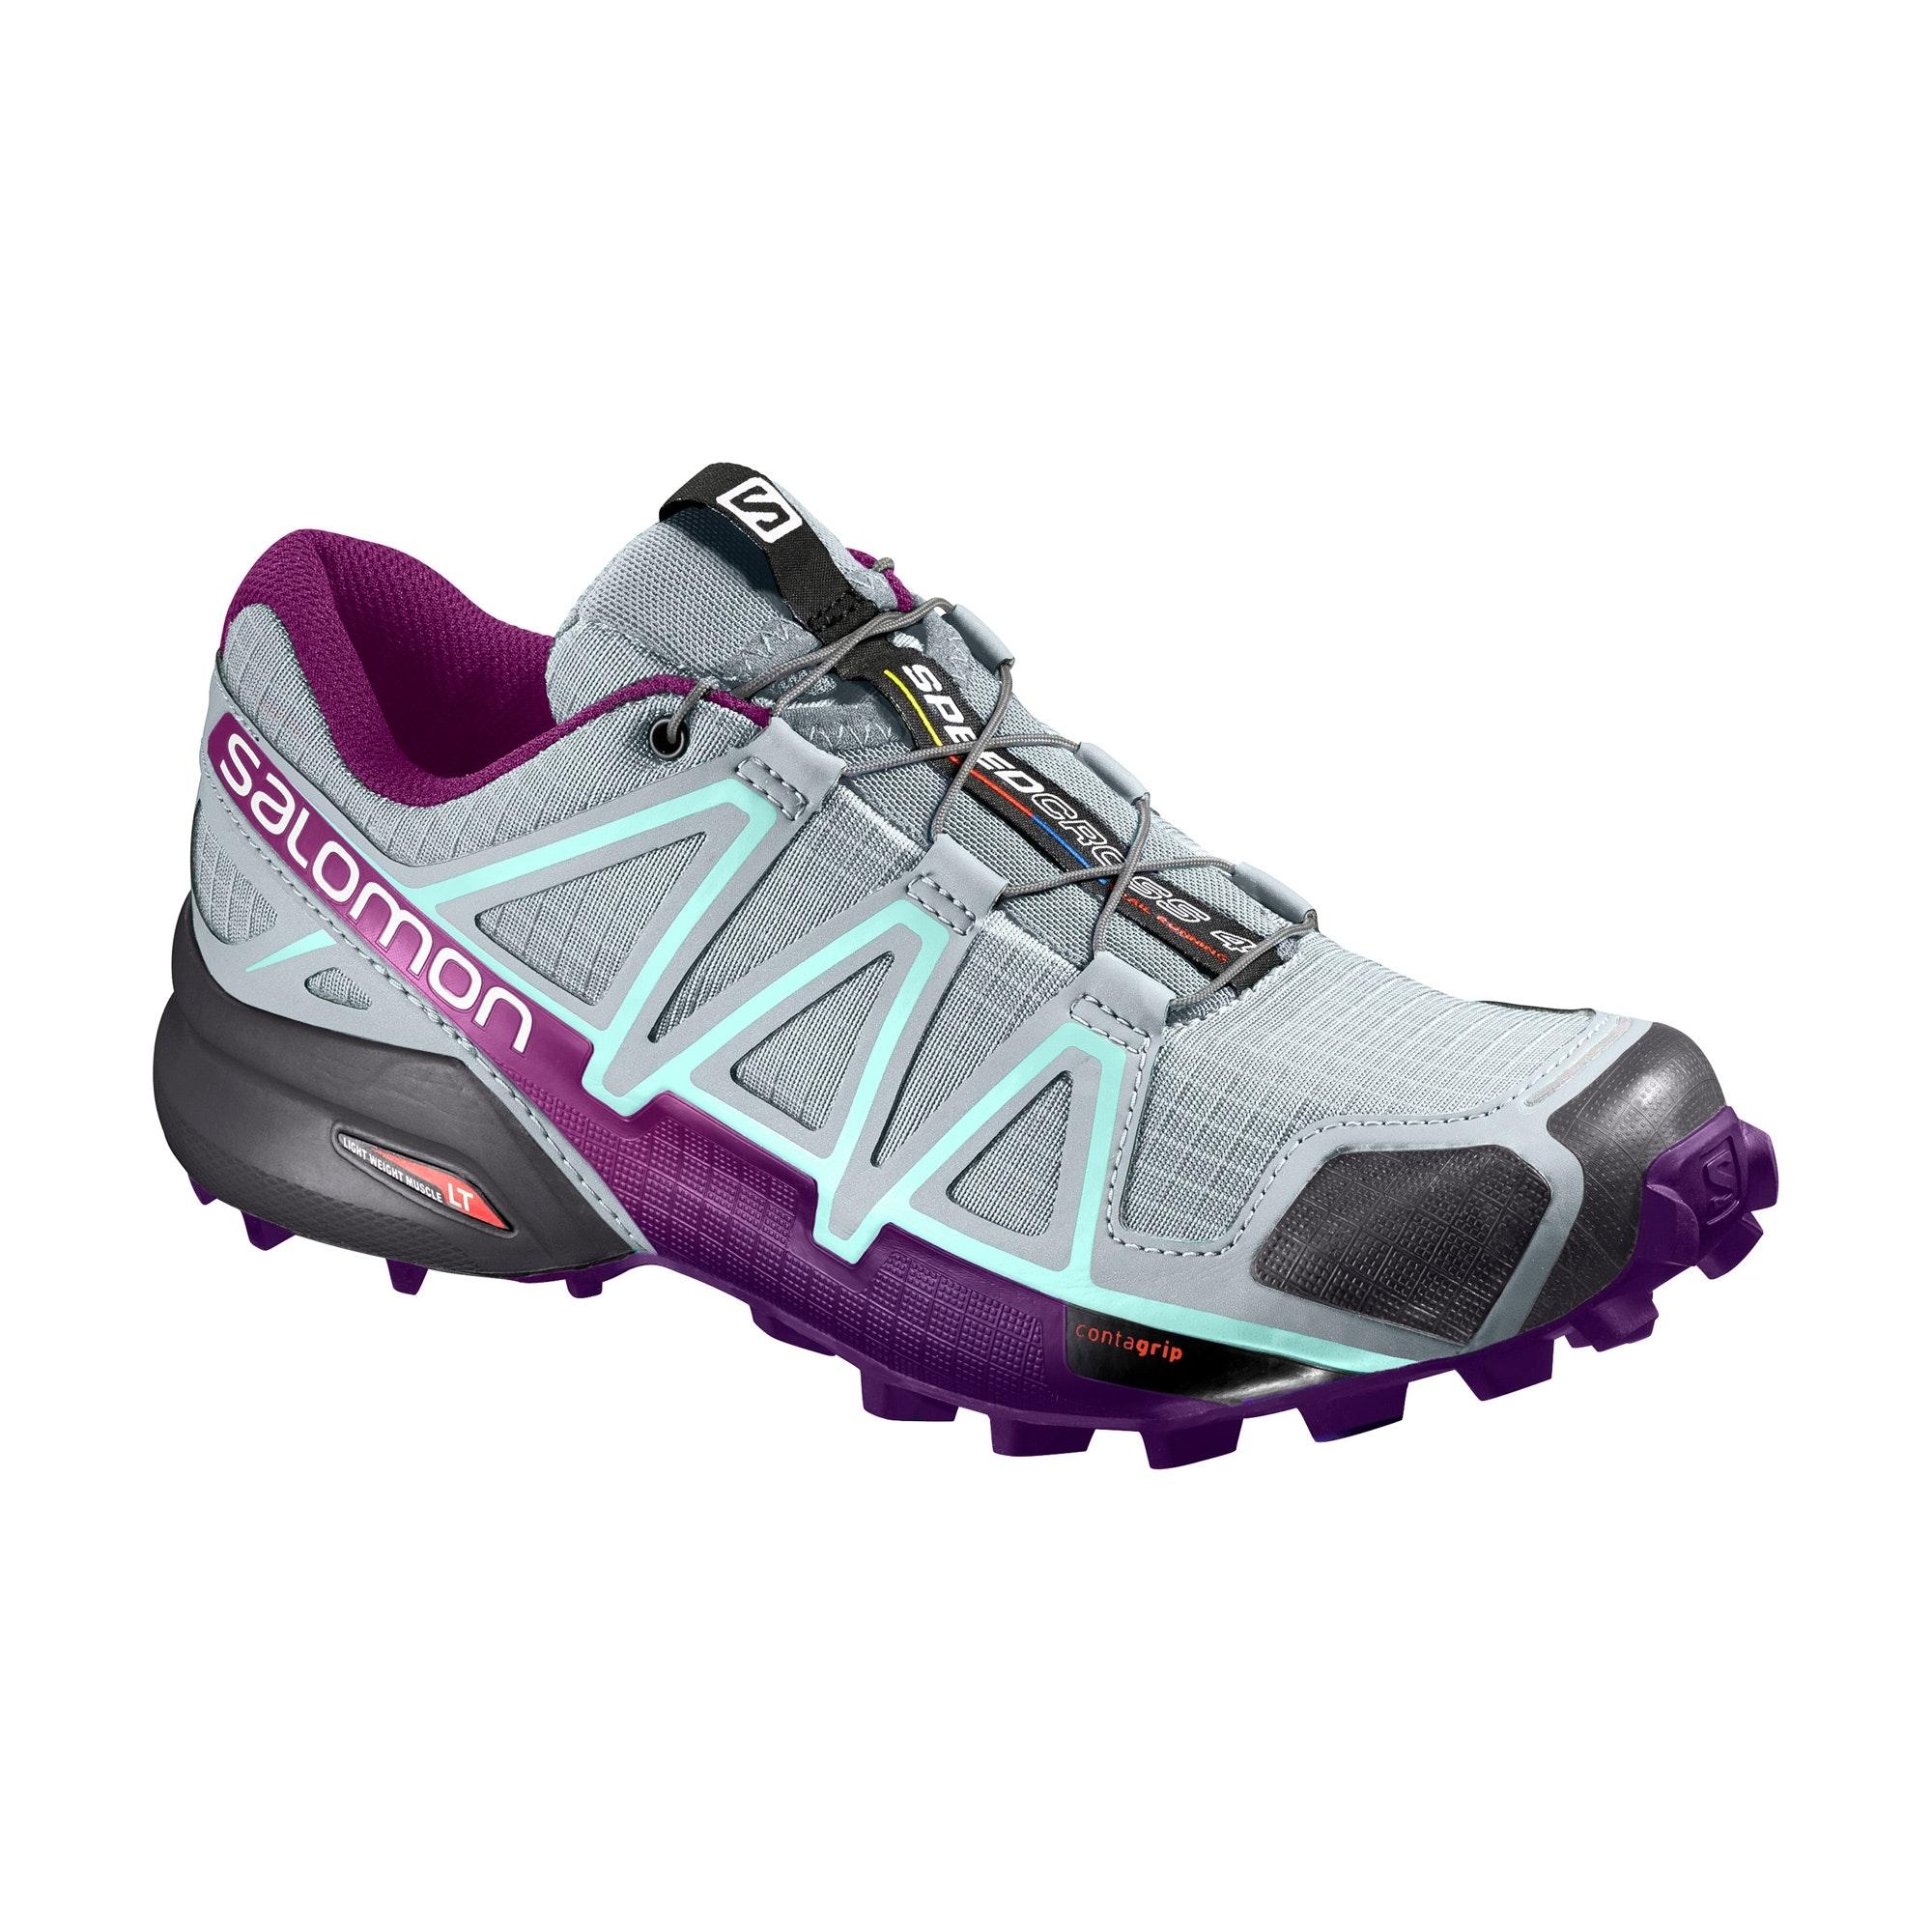 Salomon Speedcross Junior Shoes Surf The WavesCloisonne: 35